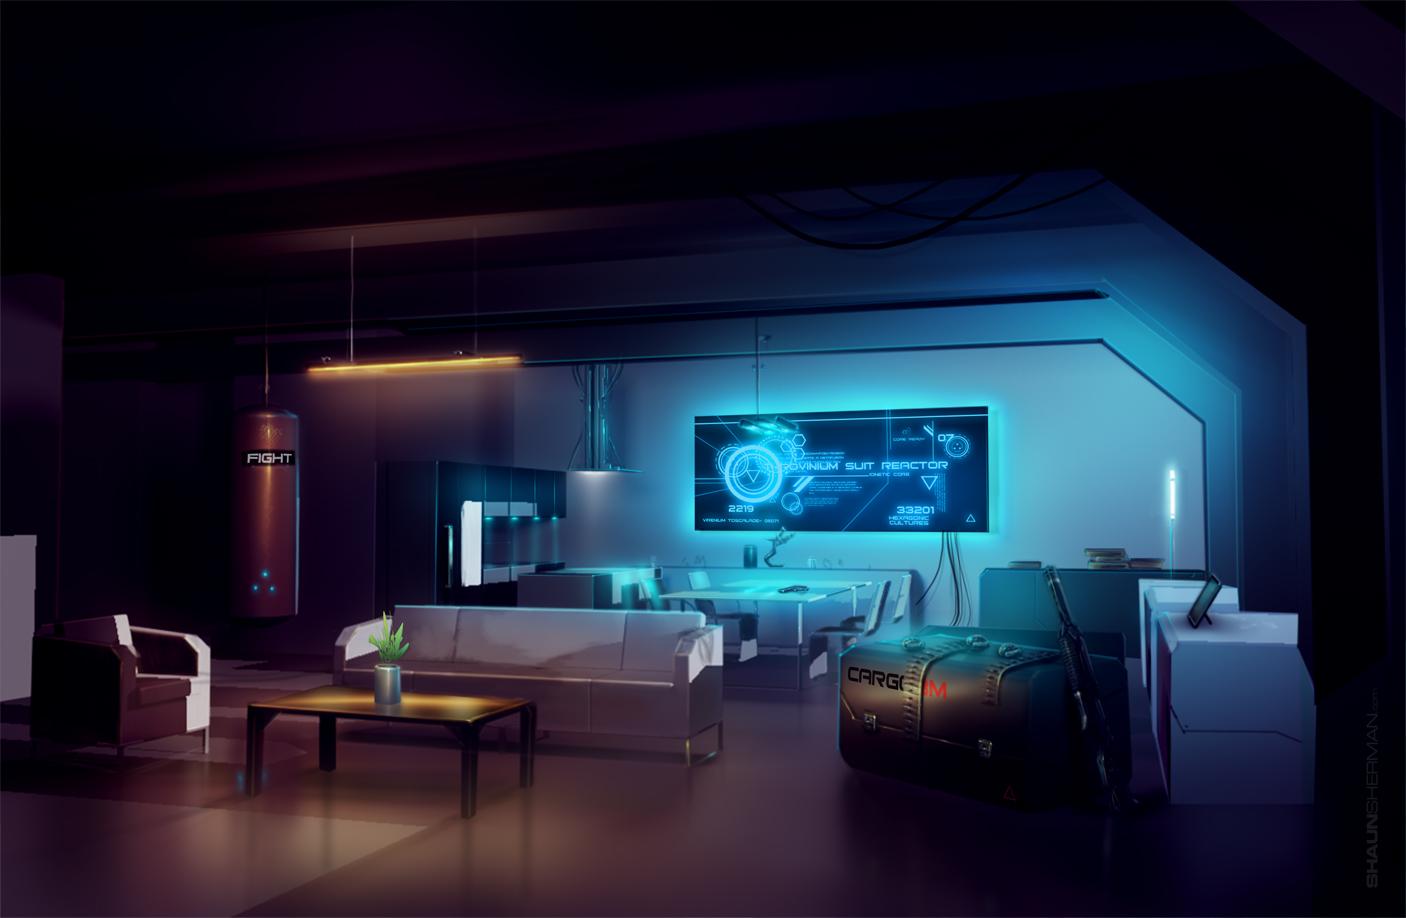 near future interior scifi concept art by shaunsherman on deviantart. Black Bedroom Furniture Sets. Home Design Ideas